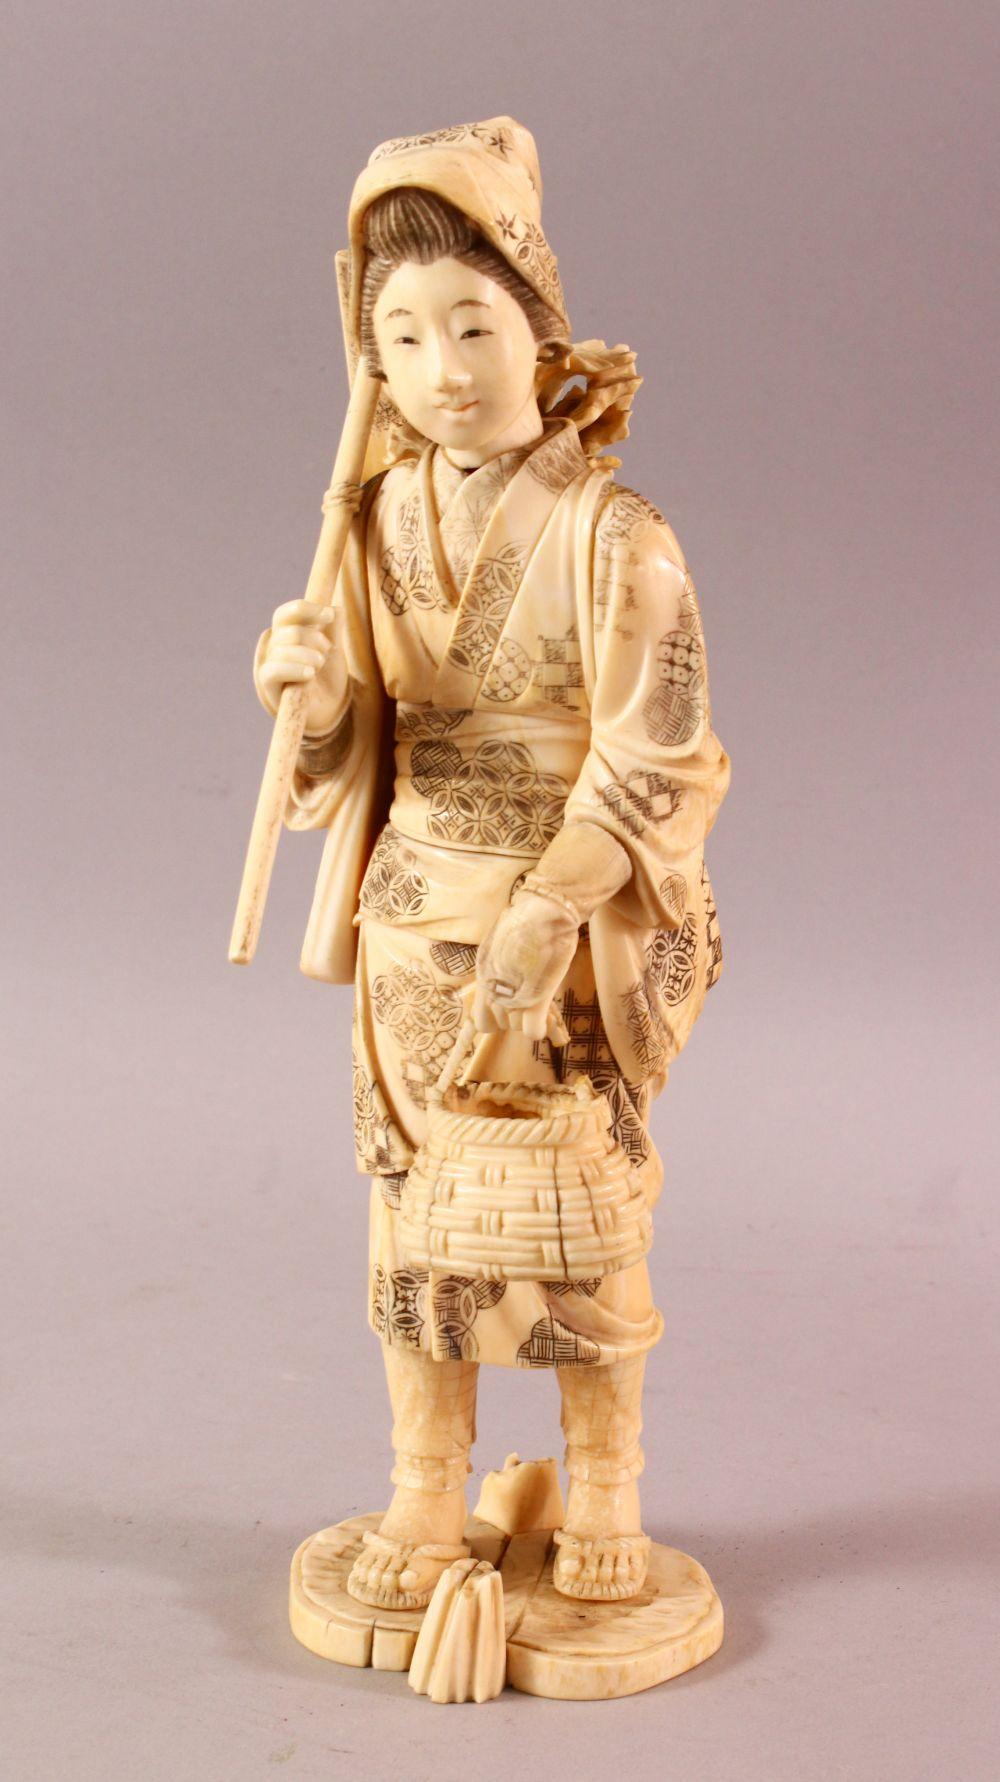 A LARGE JAPANESE MEIJI PERIOD CARVED IVORY OKIMONO - FARMER - the large okimono depicting a female